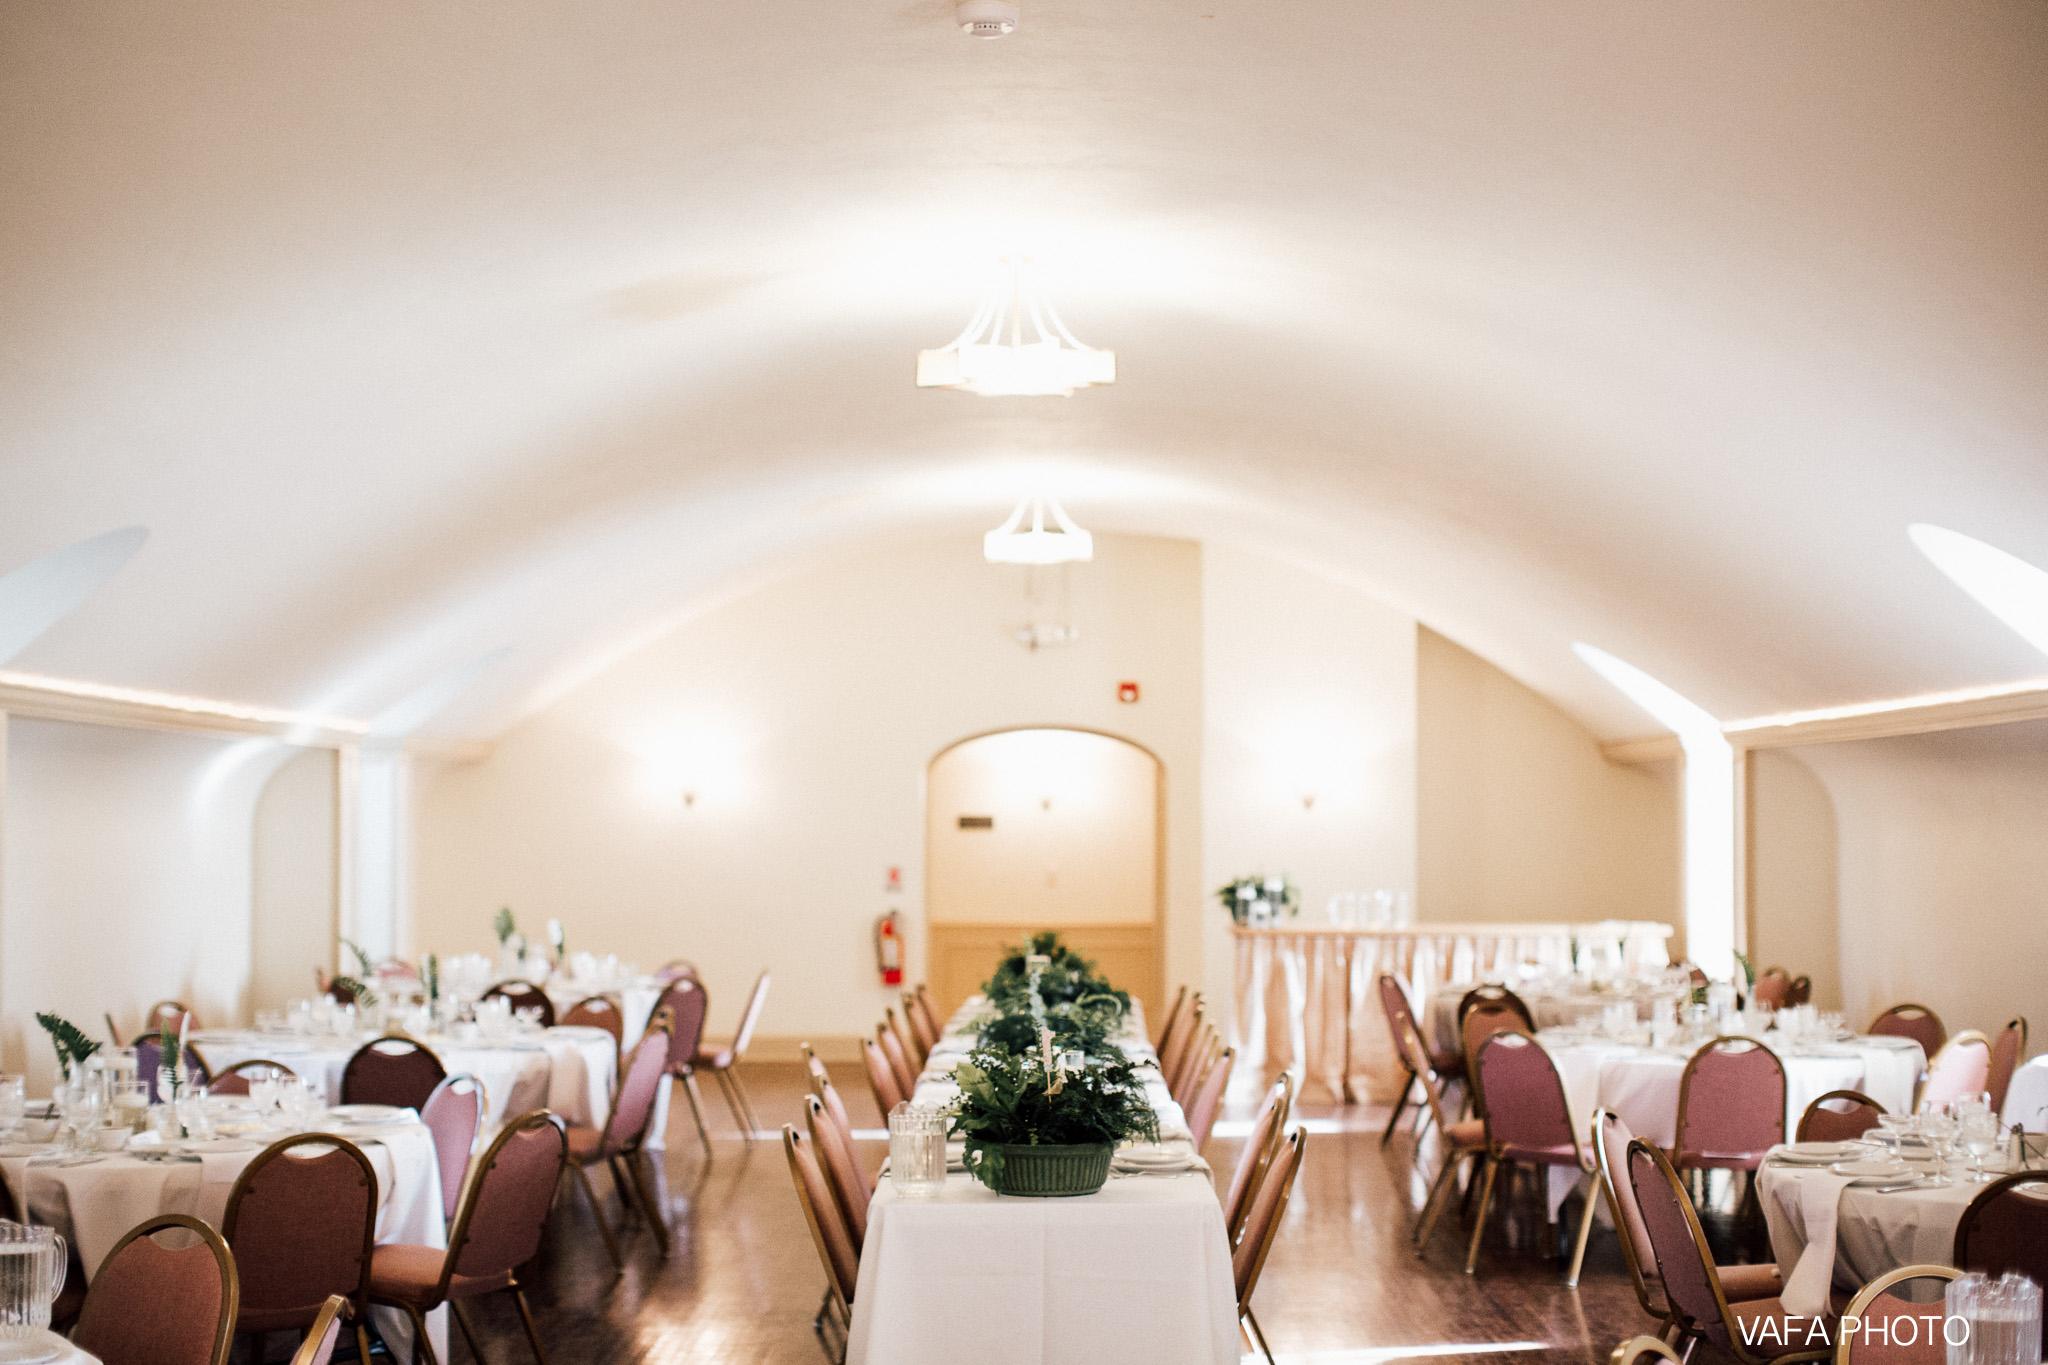 The-Felt-Estate-Wedding-Kailie-David-Vafa-Photo-909.jpg